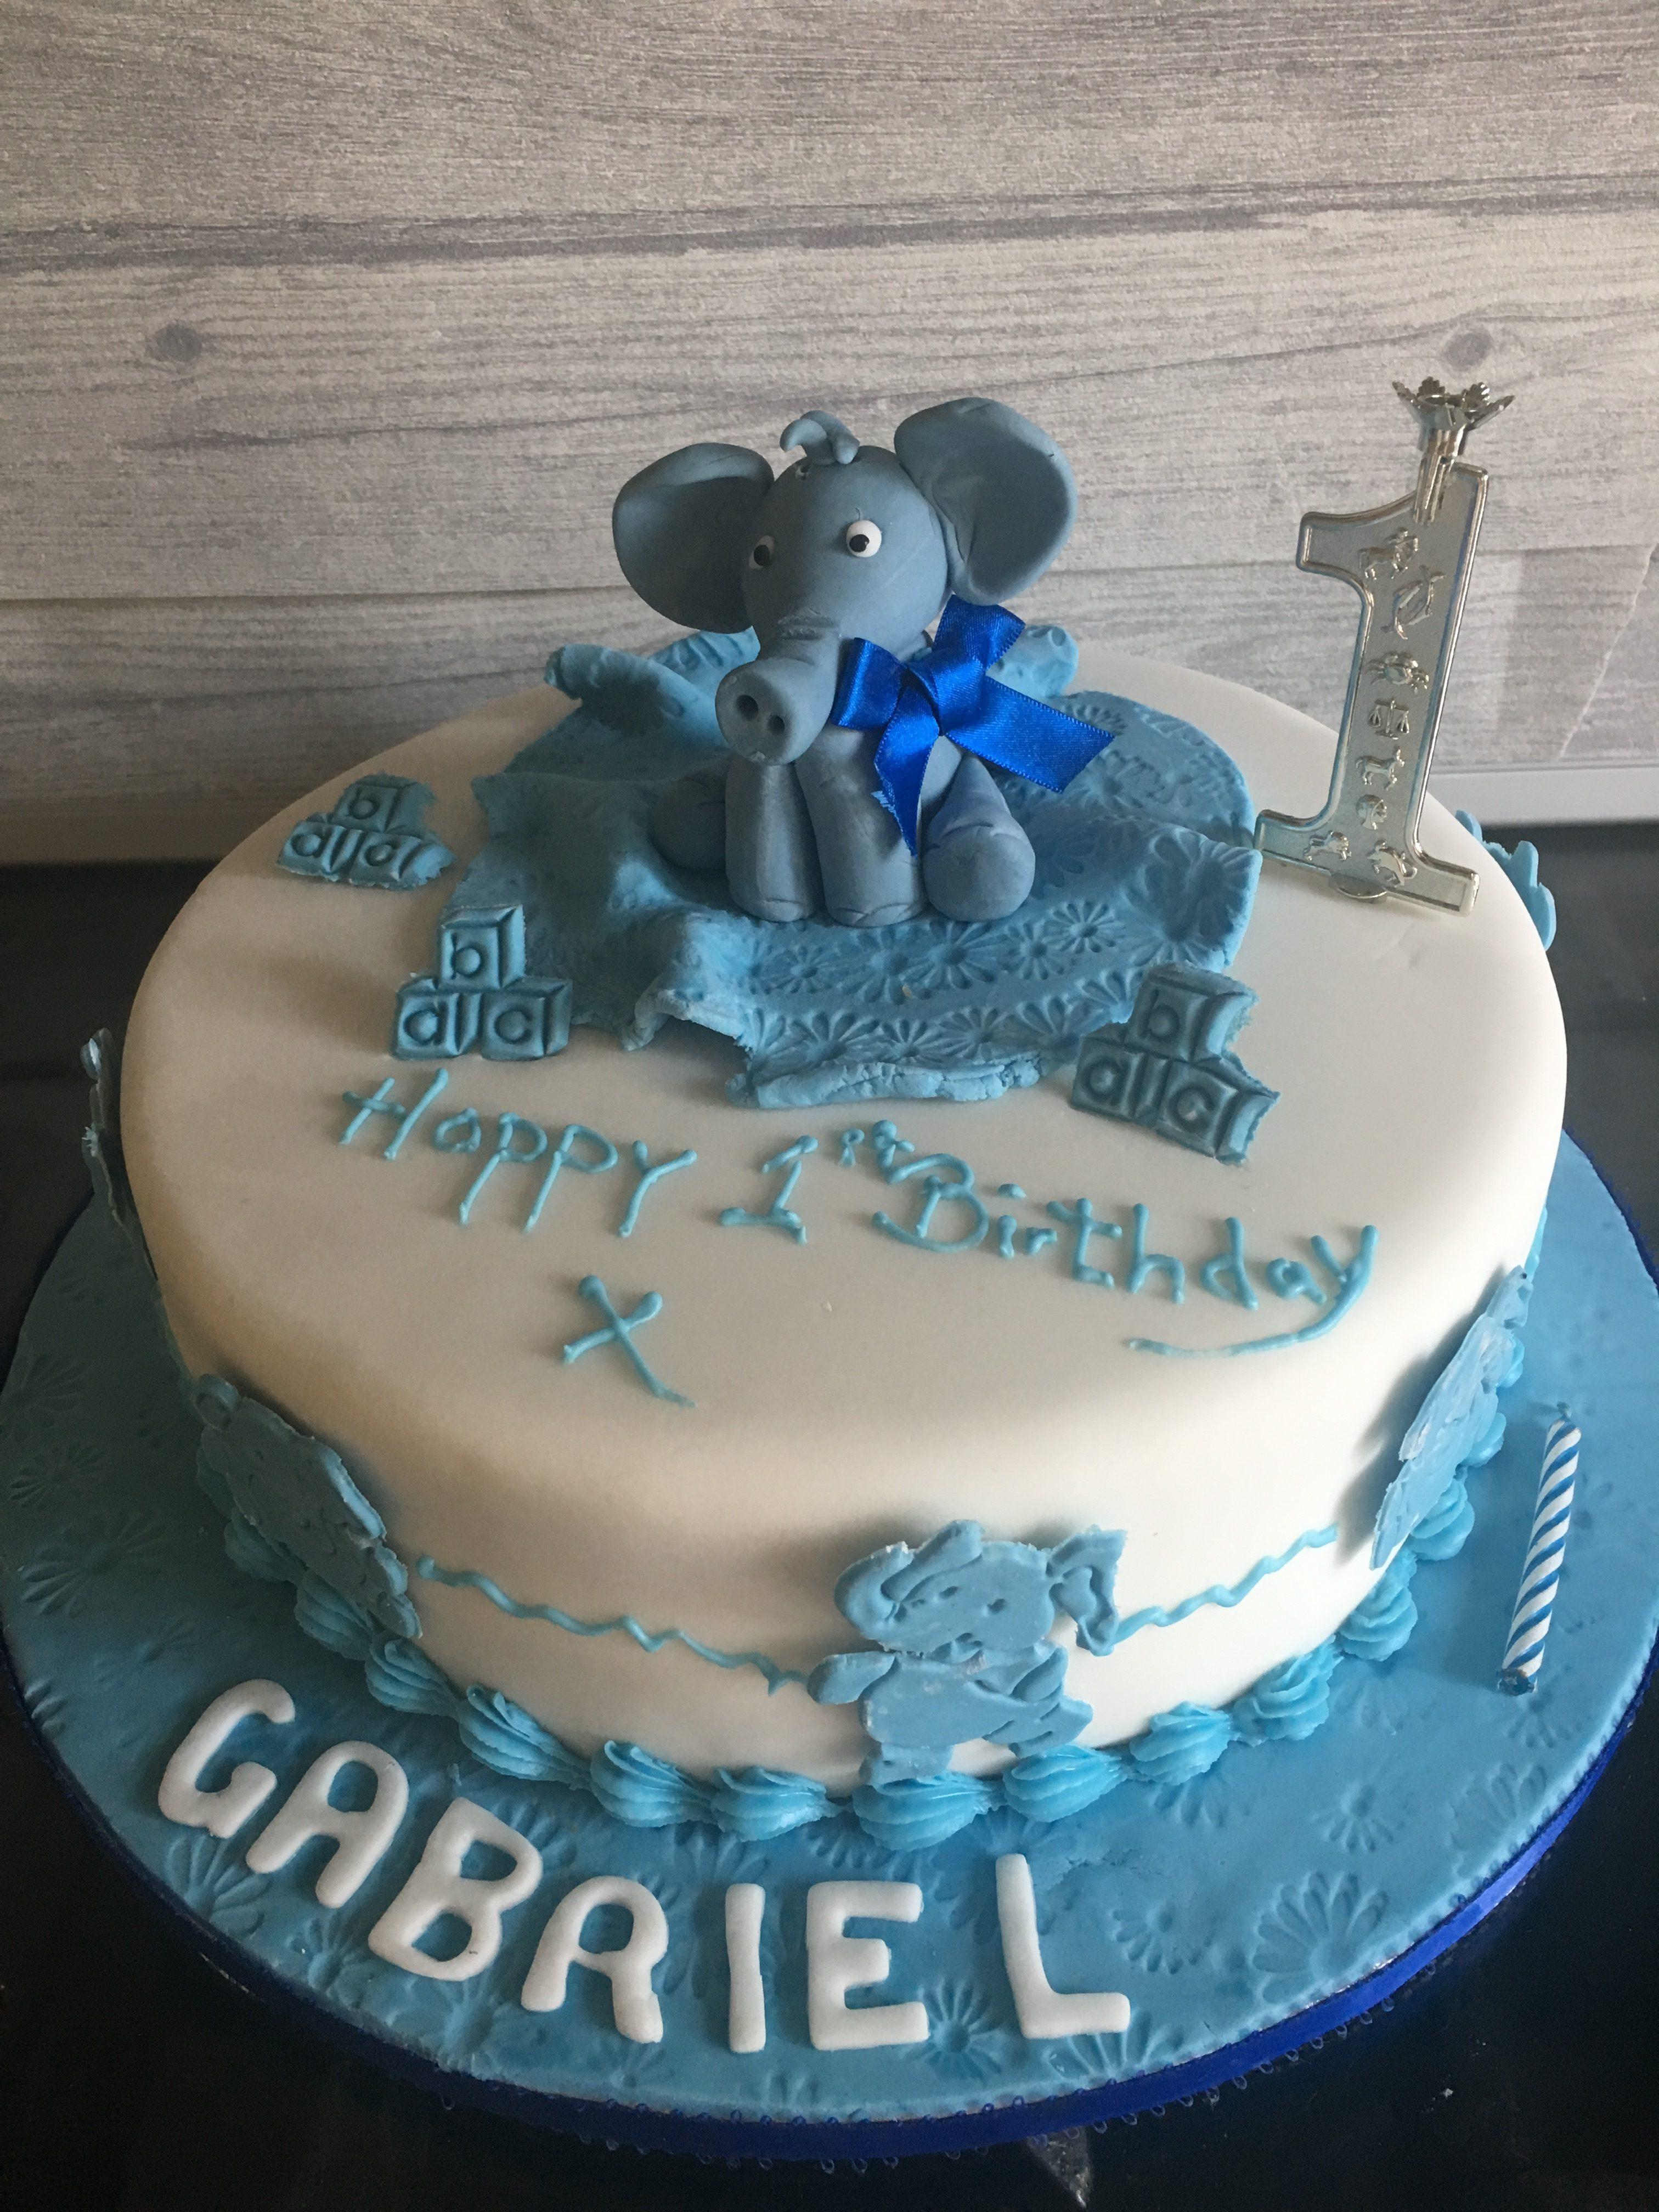 No one Birthday cake